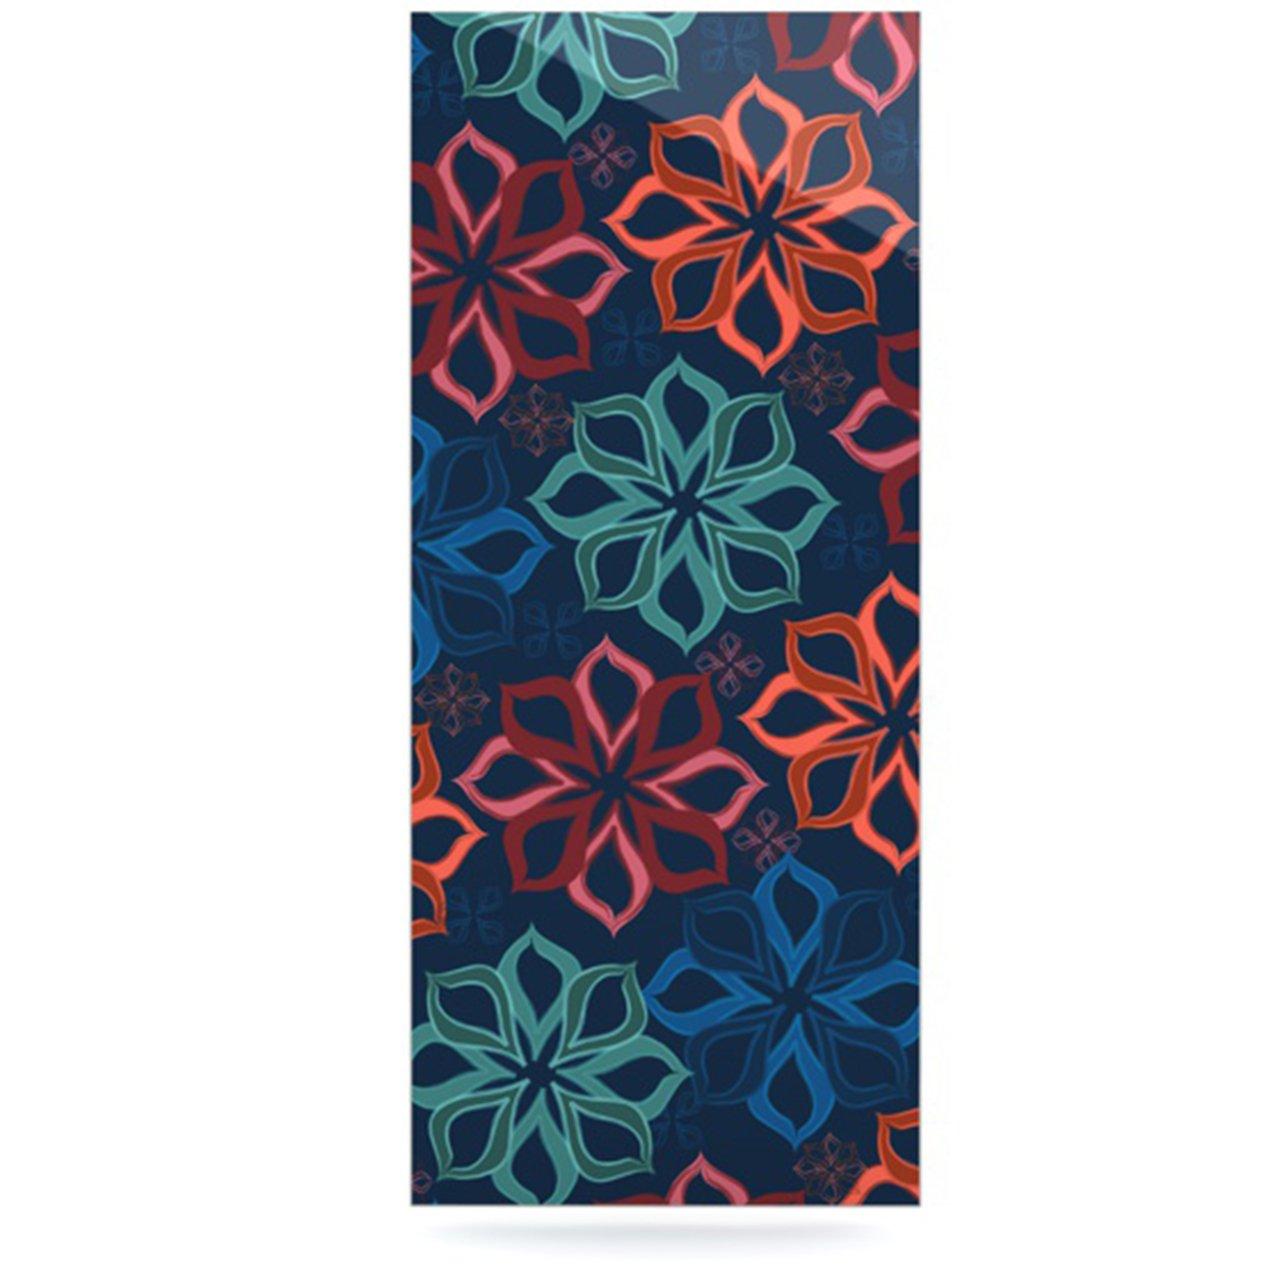 24 X 36 Kess InHouse JH2002AWR03 Jolene Heckman Floral Charm Blue Flowers Luxe Rectangle Panel